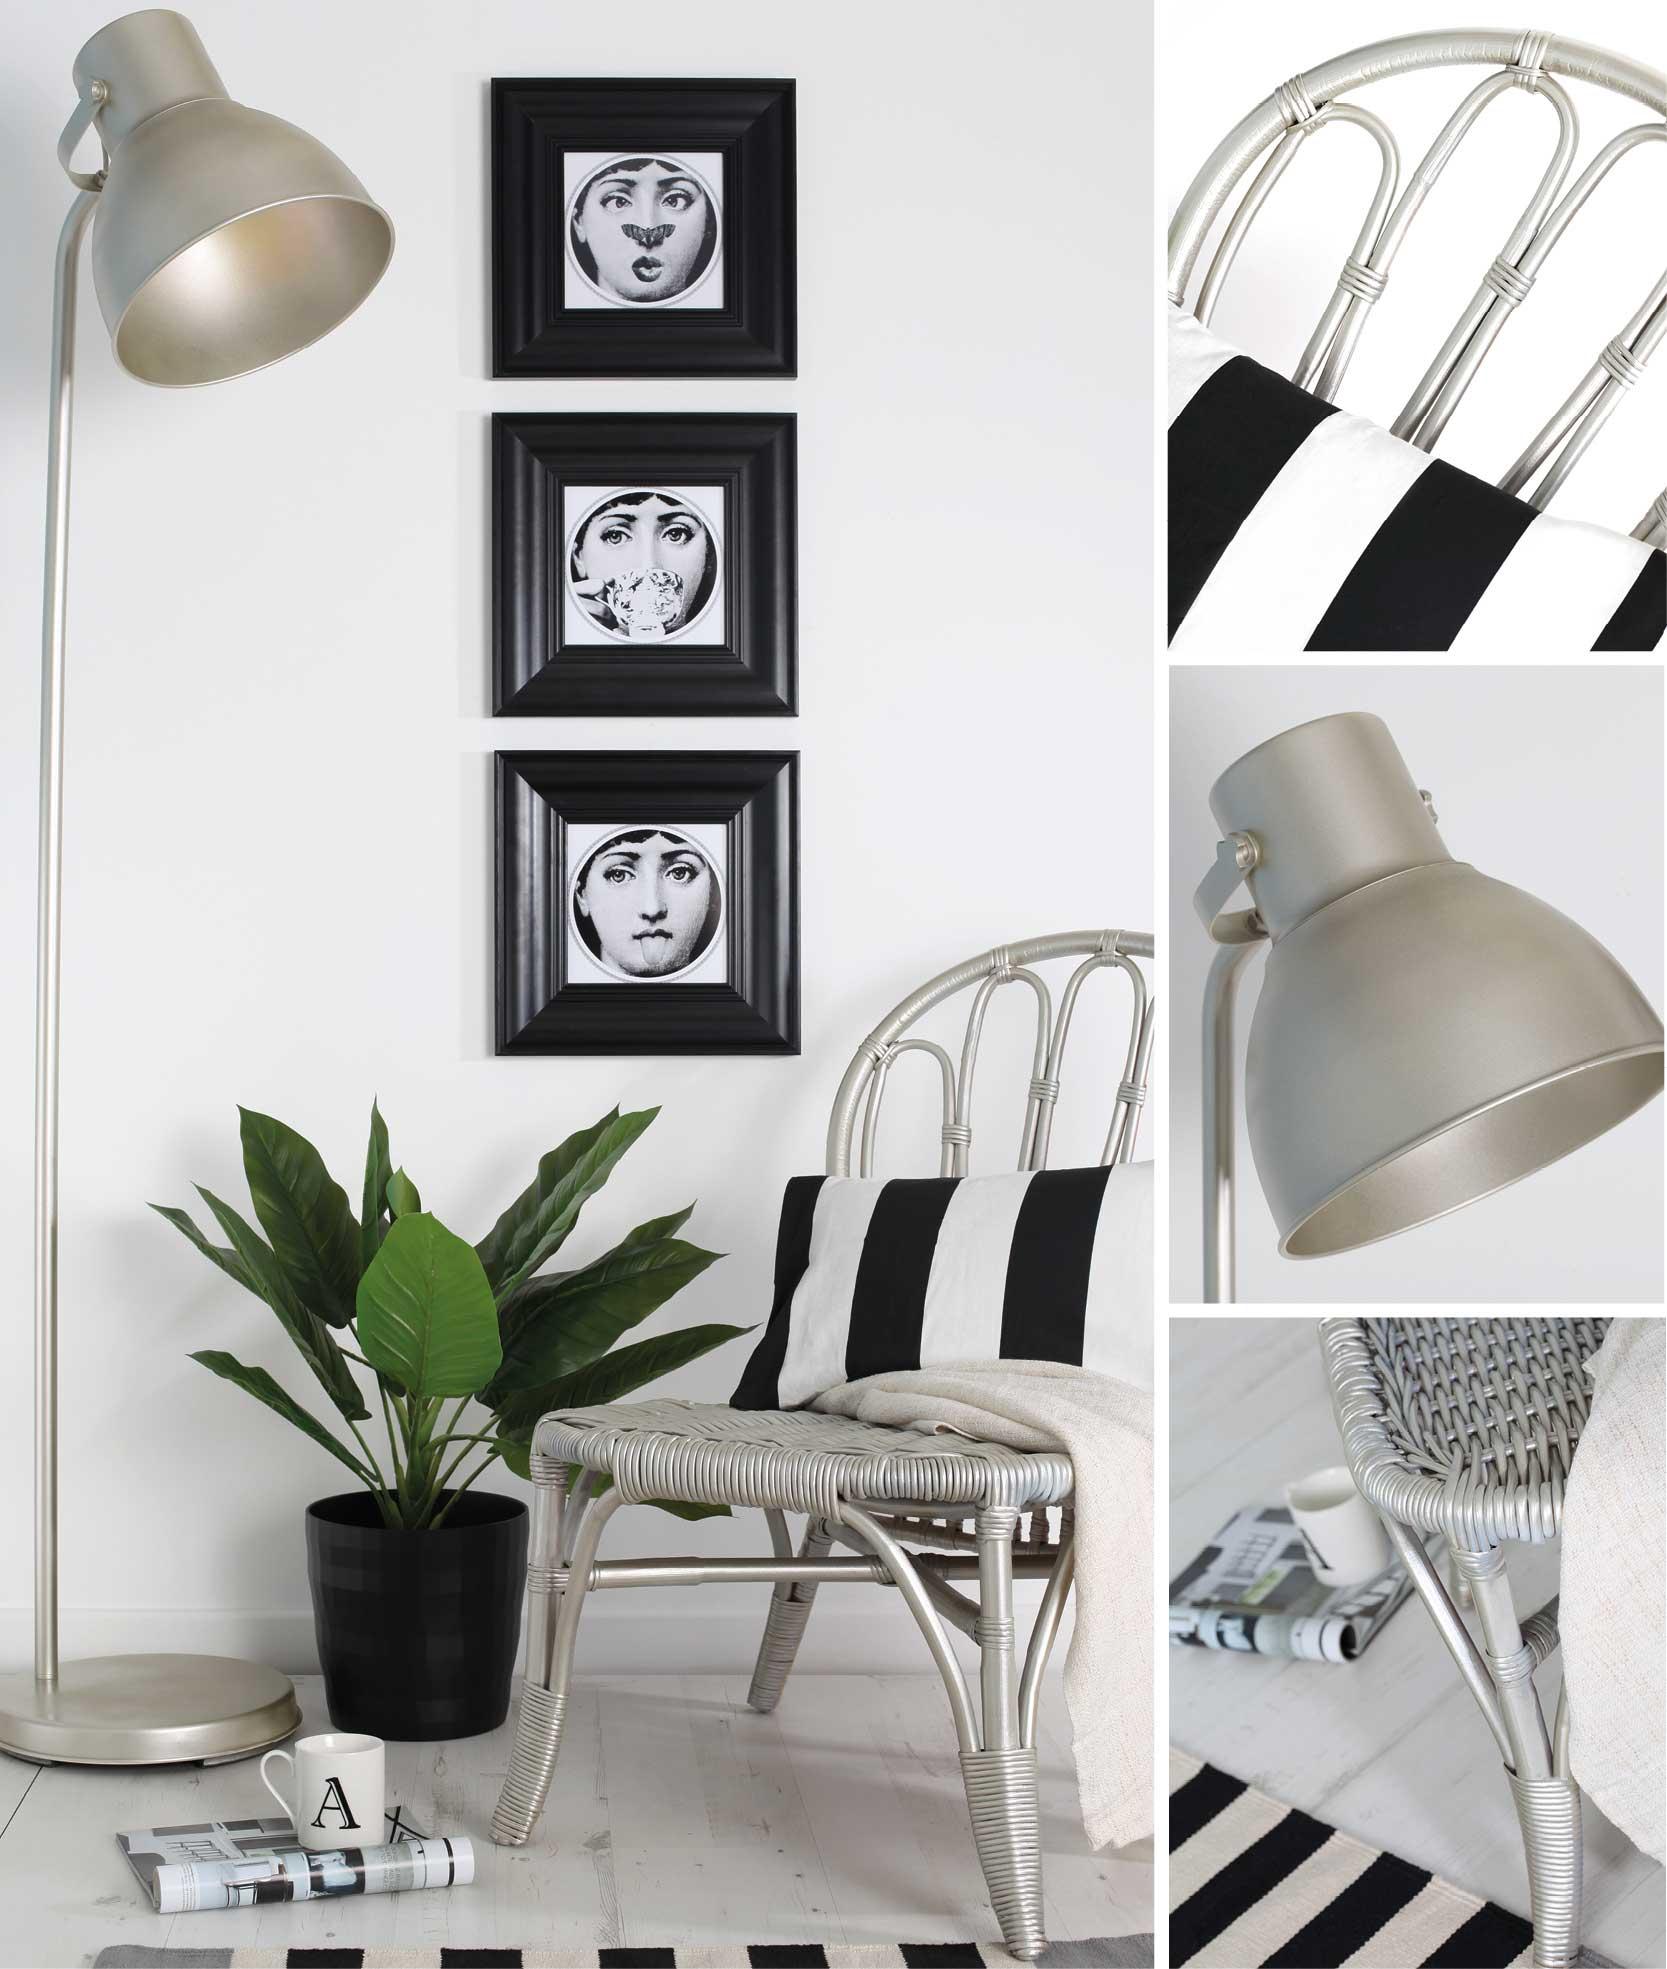 Metallic-White-Gold-Chair-&-Close-Ups